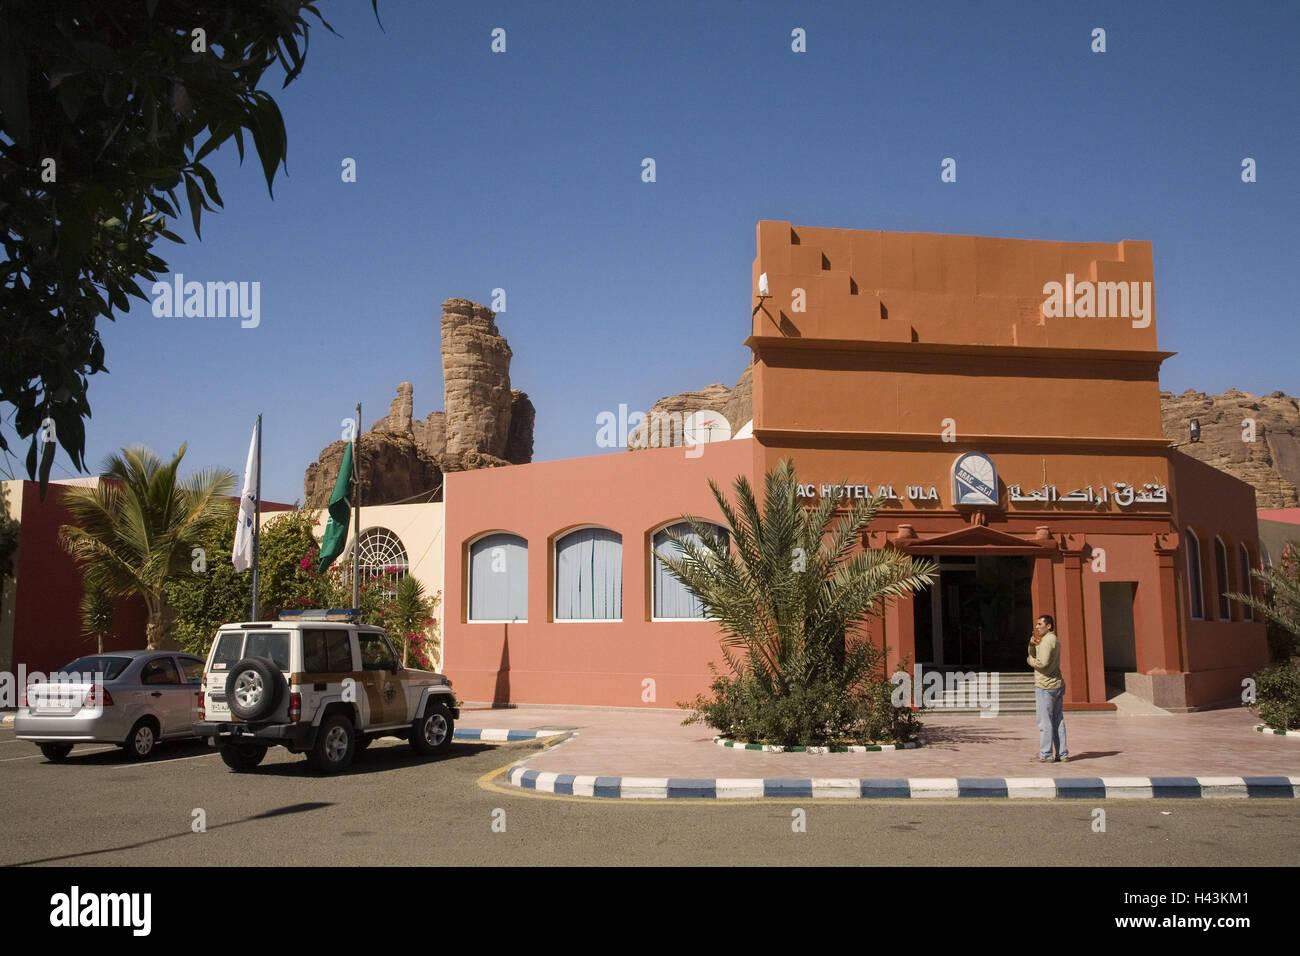 Saudi Arabia, province Tabuk, place Al Ula, - Stock Image